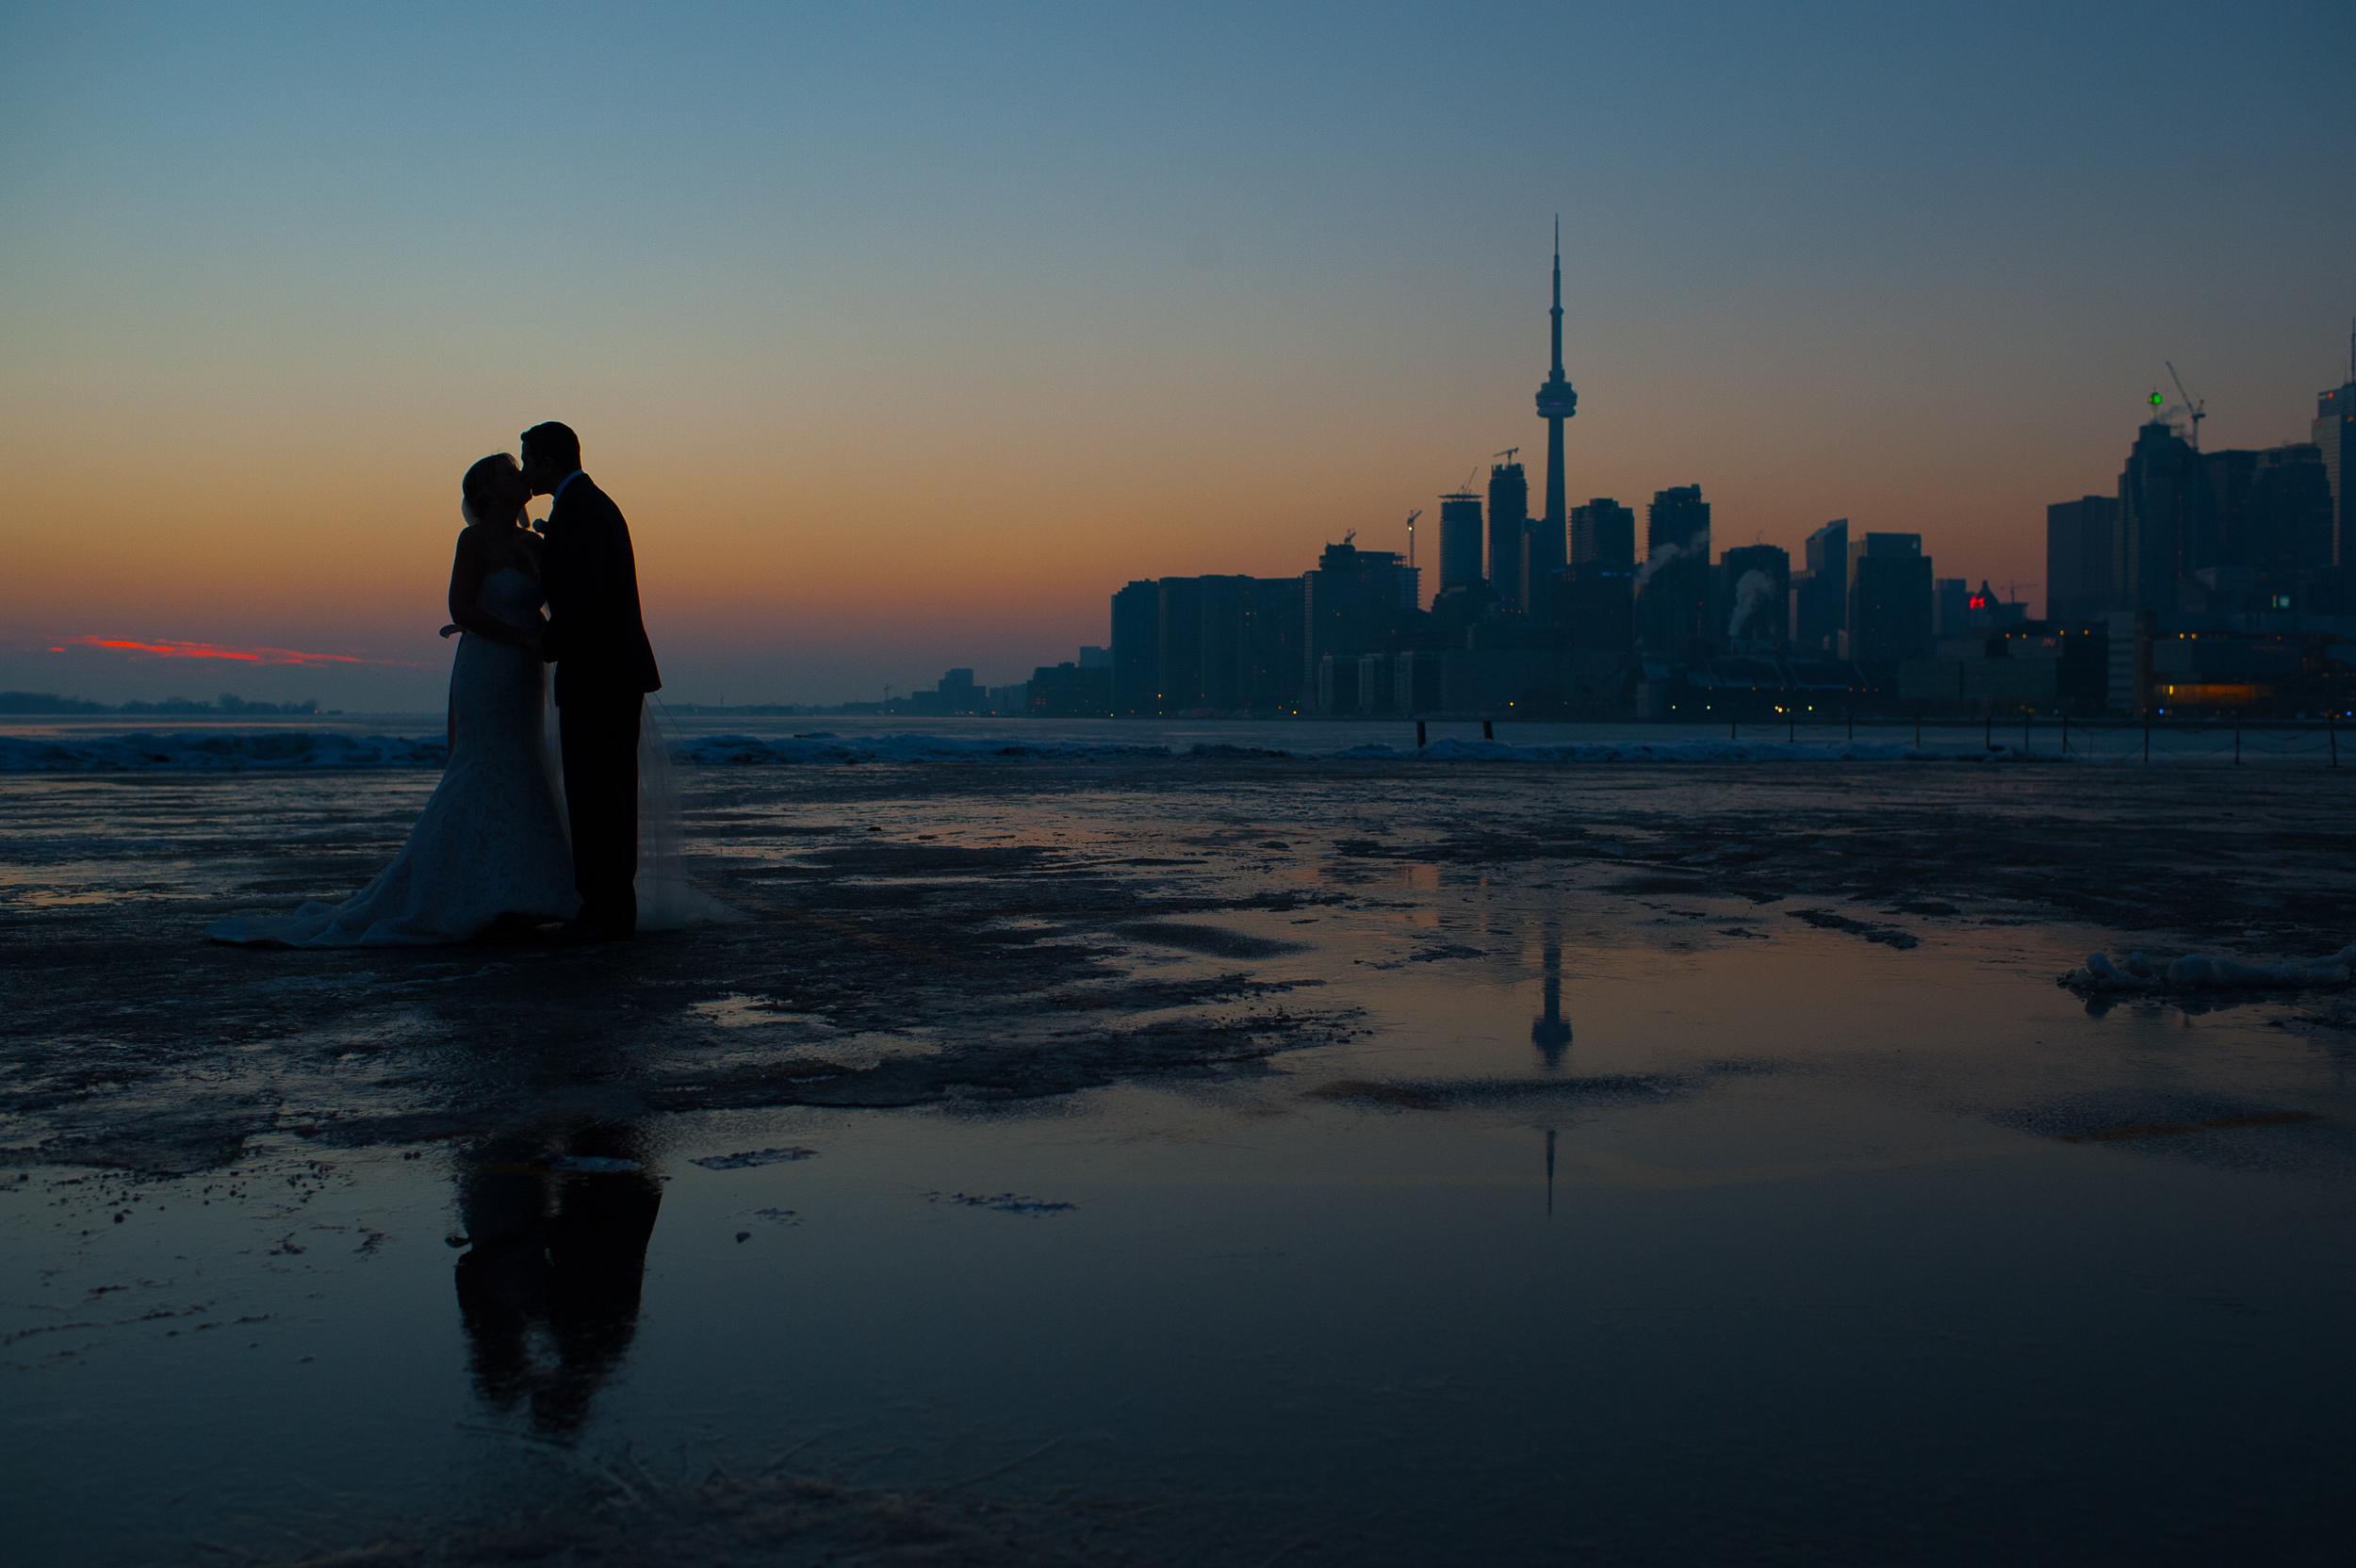 enoch-turner-wedding-photograph-008.jpg